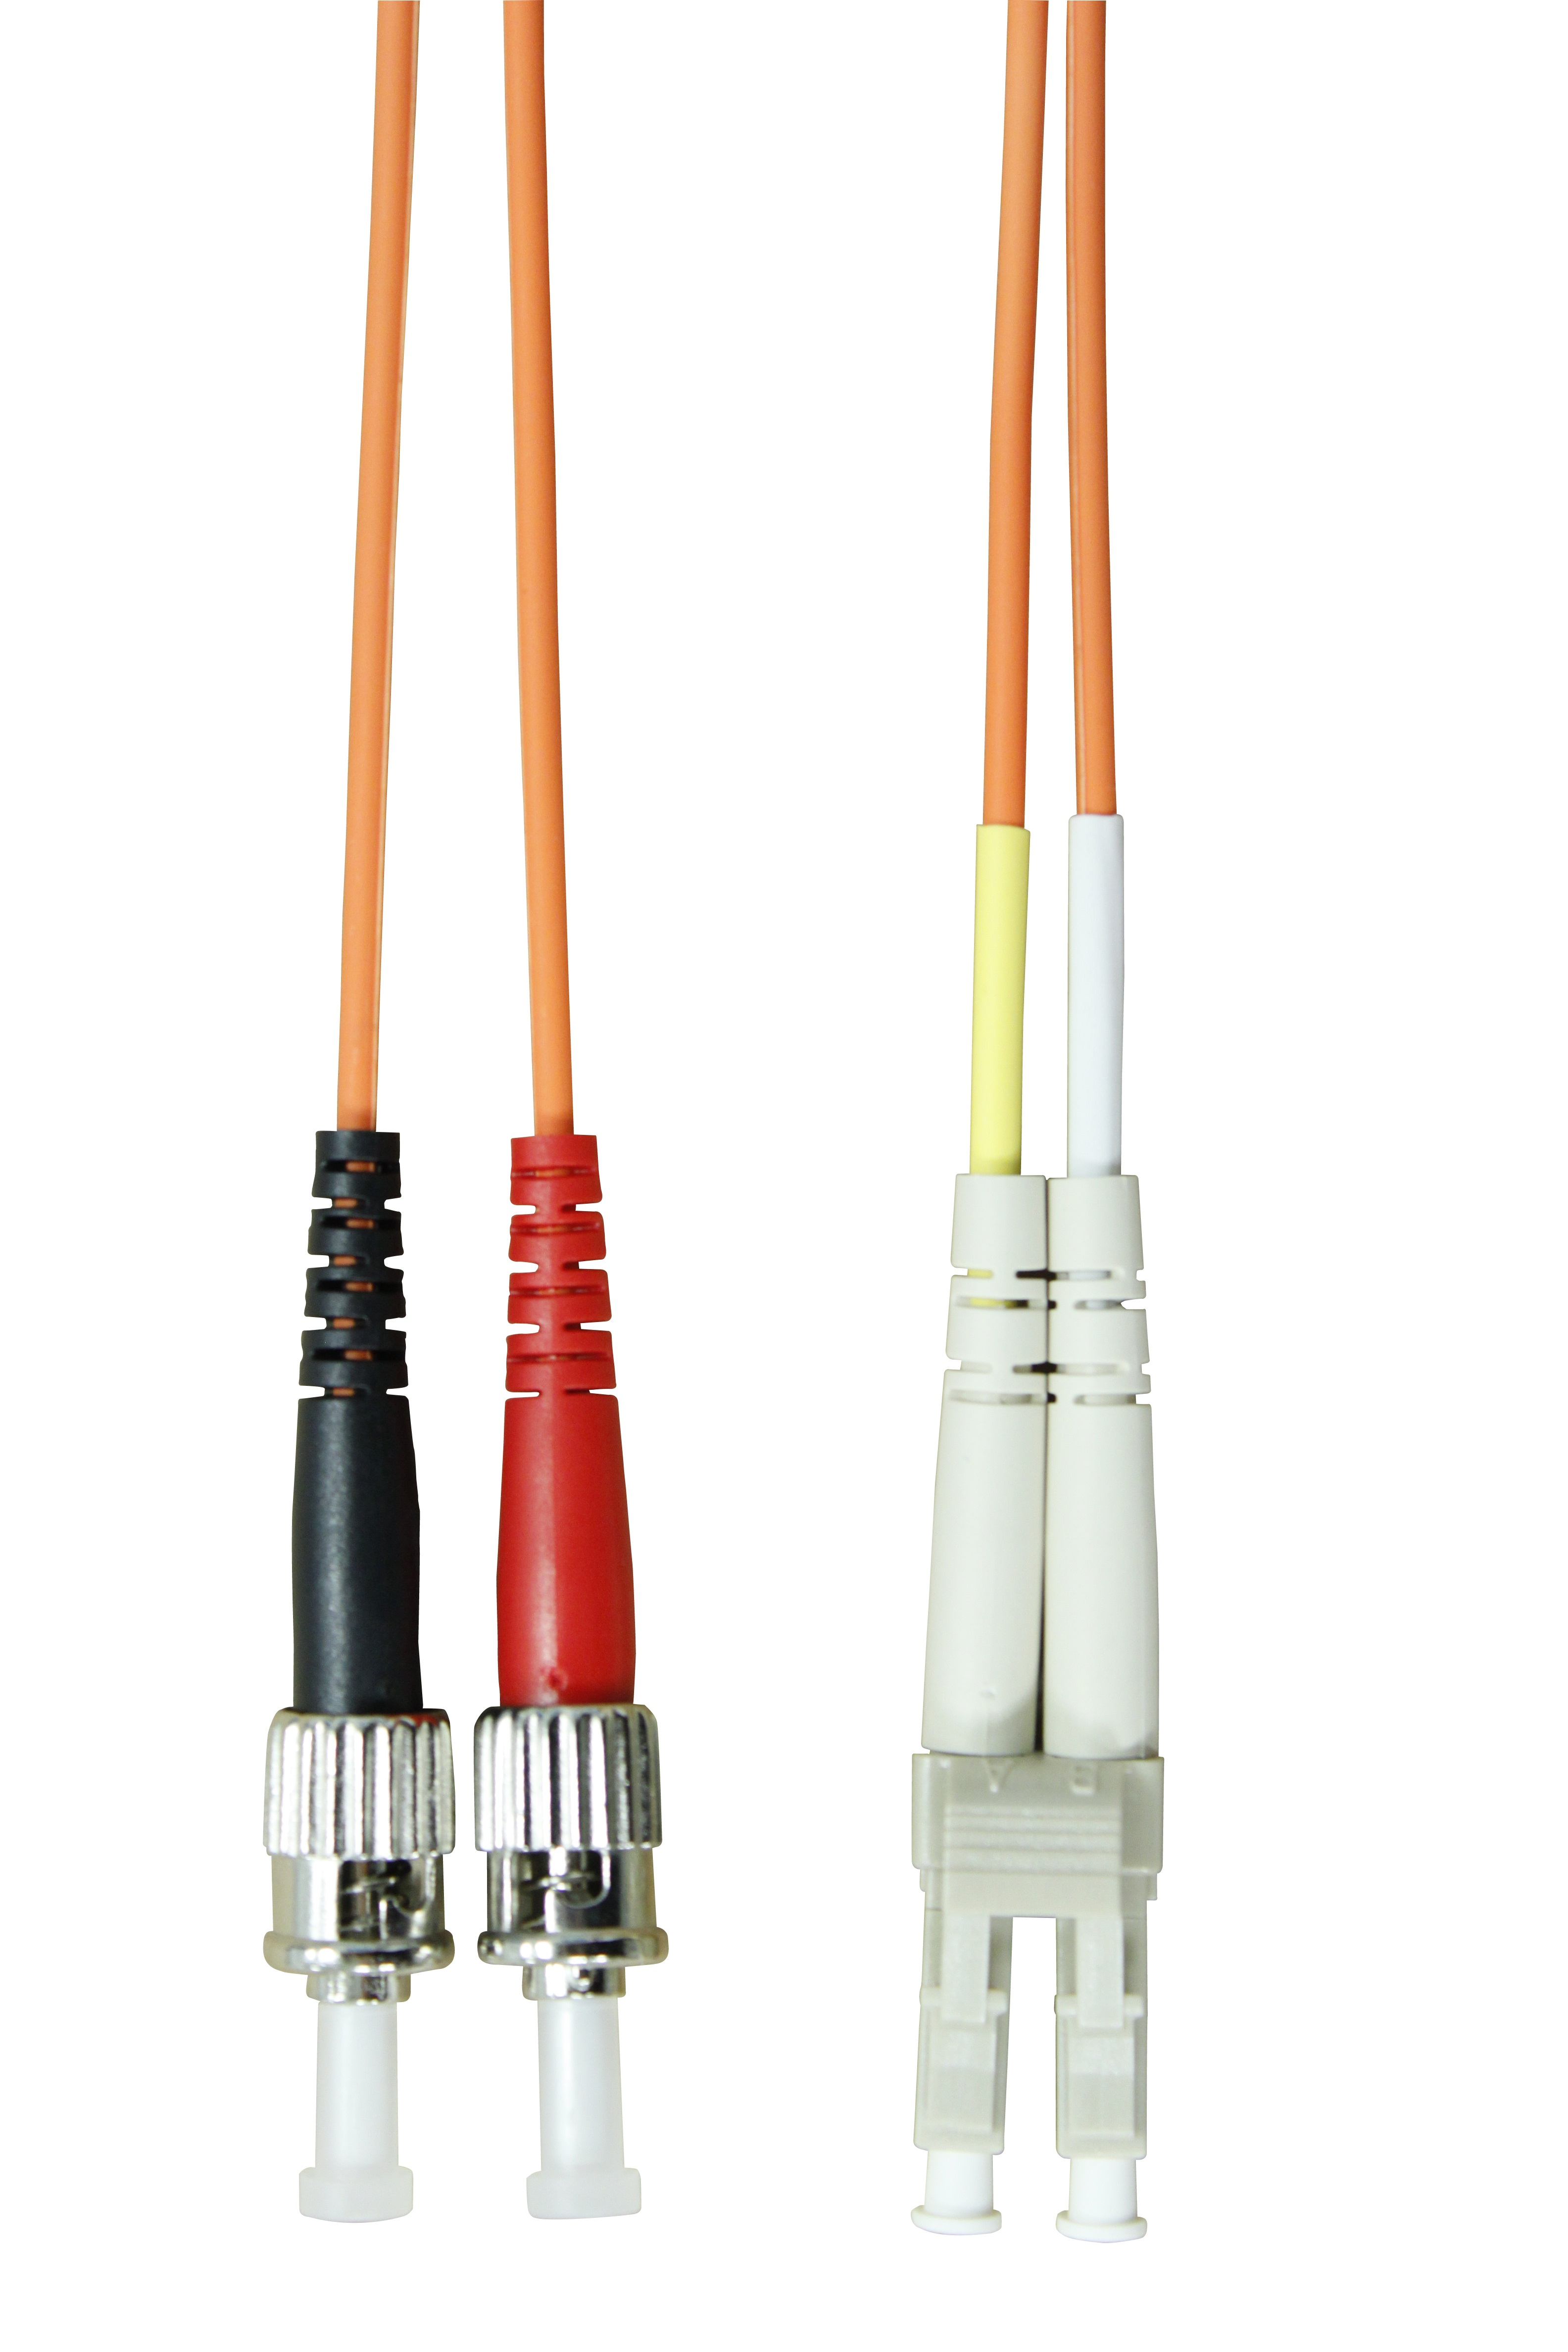 1 Stk LWL Patchkabel Duplex LC/ST,62,5/125µm OM1, LS0H, orange, 3m HLP26LT03F